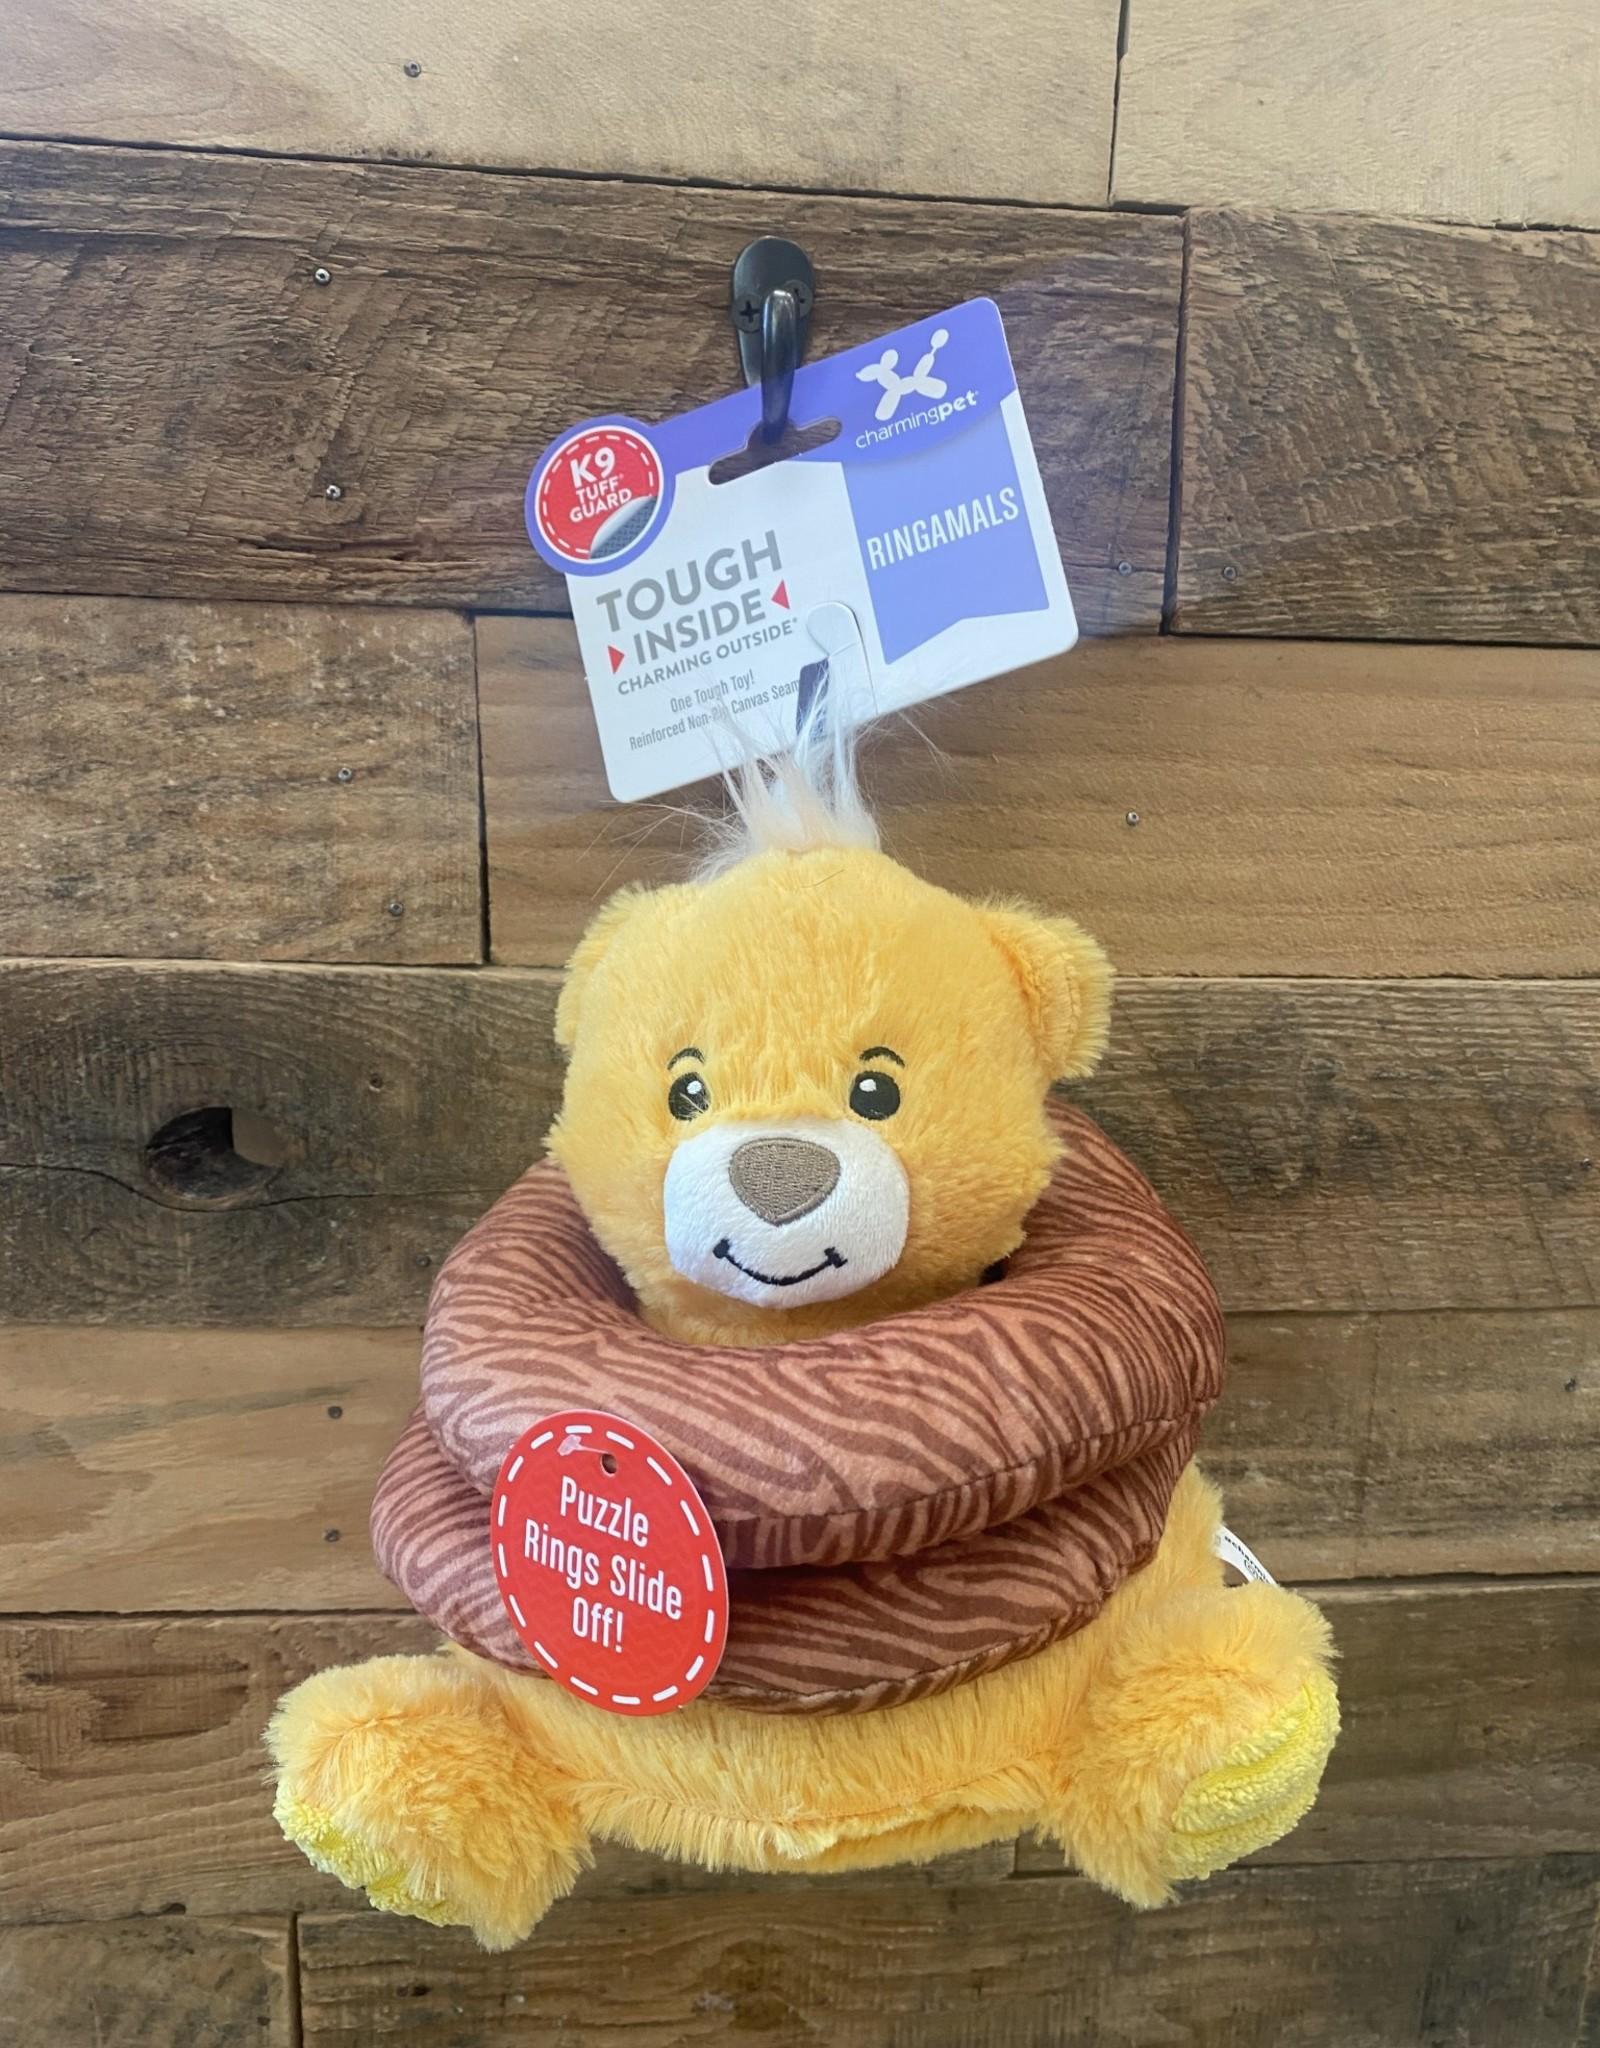 Charming Pet Charming Pet Ringamals Bear Medium